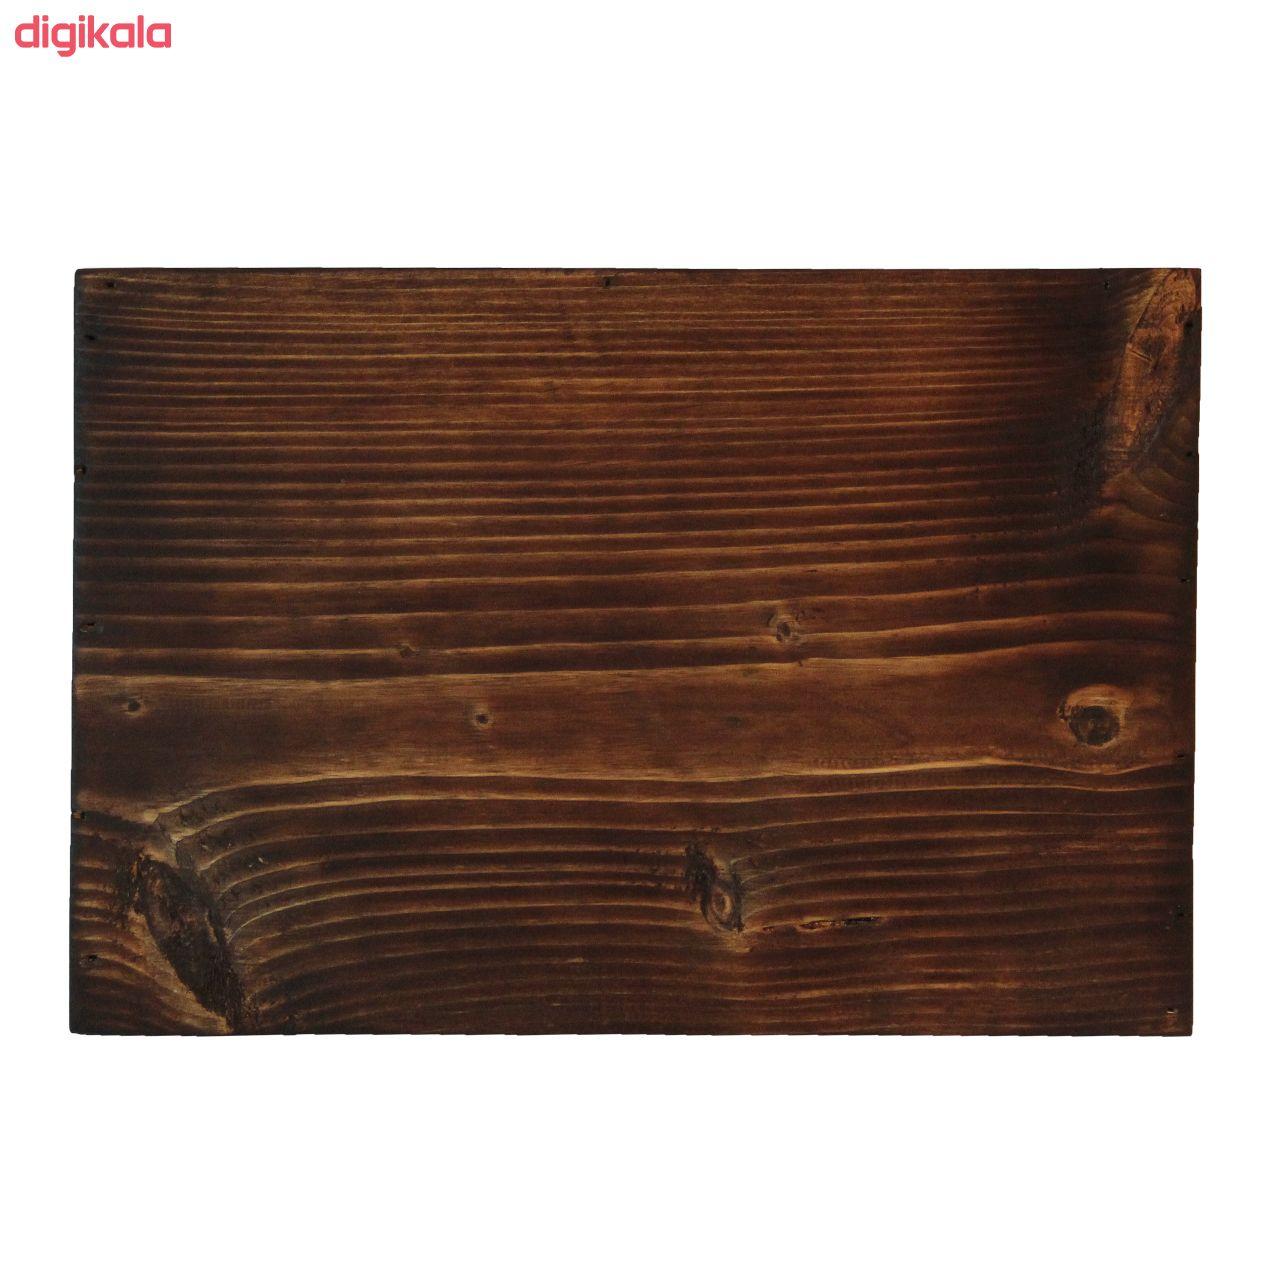 شلف دیواری کد 219 main 1 5